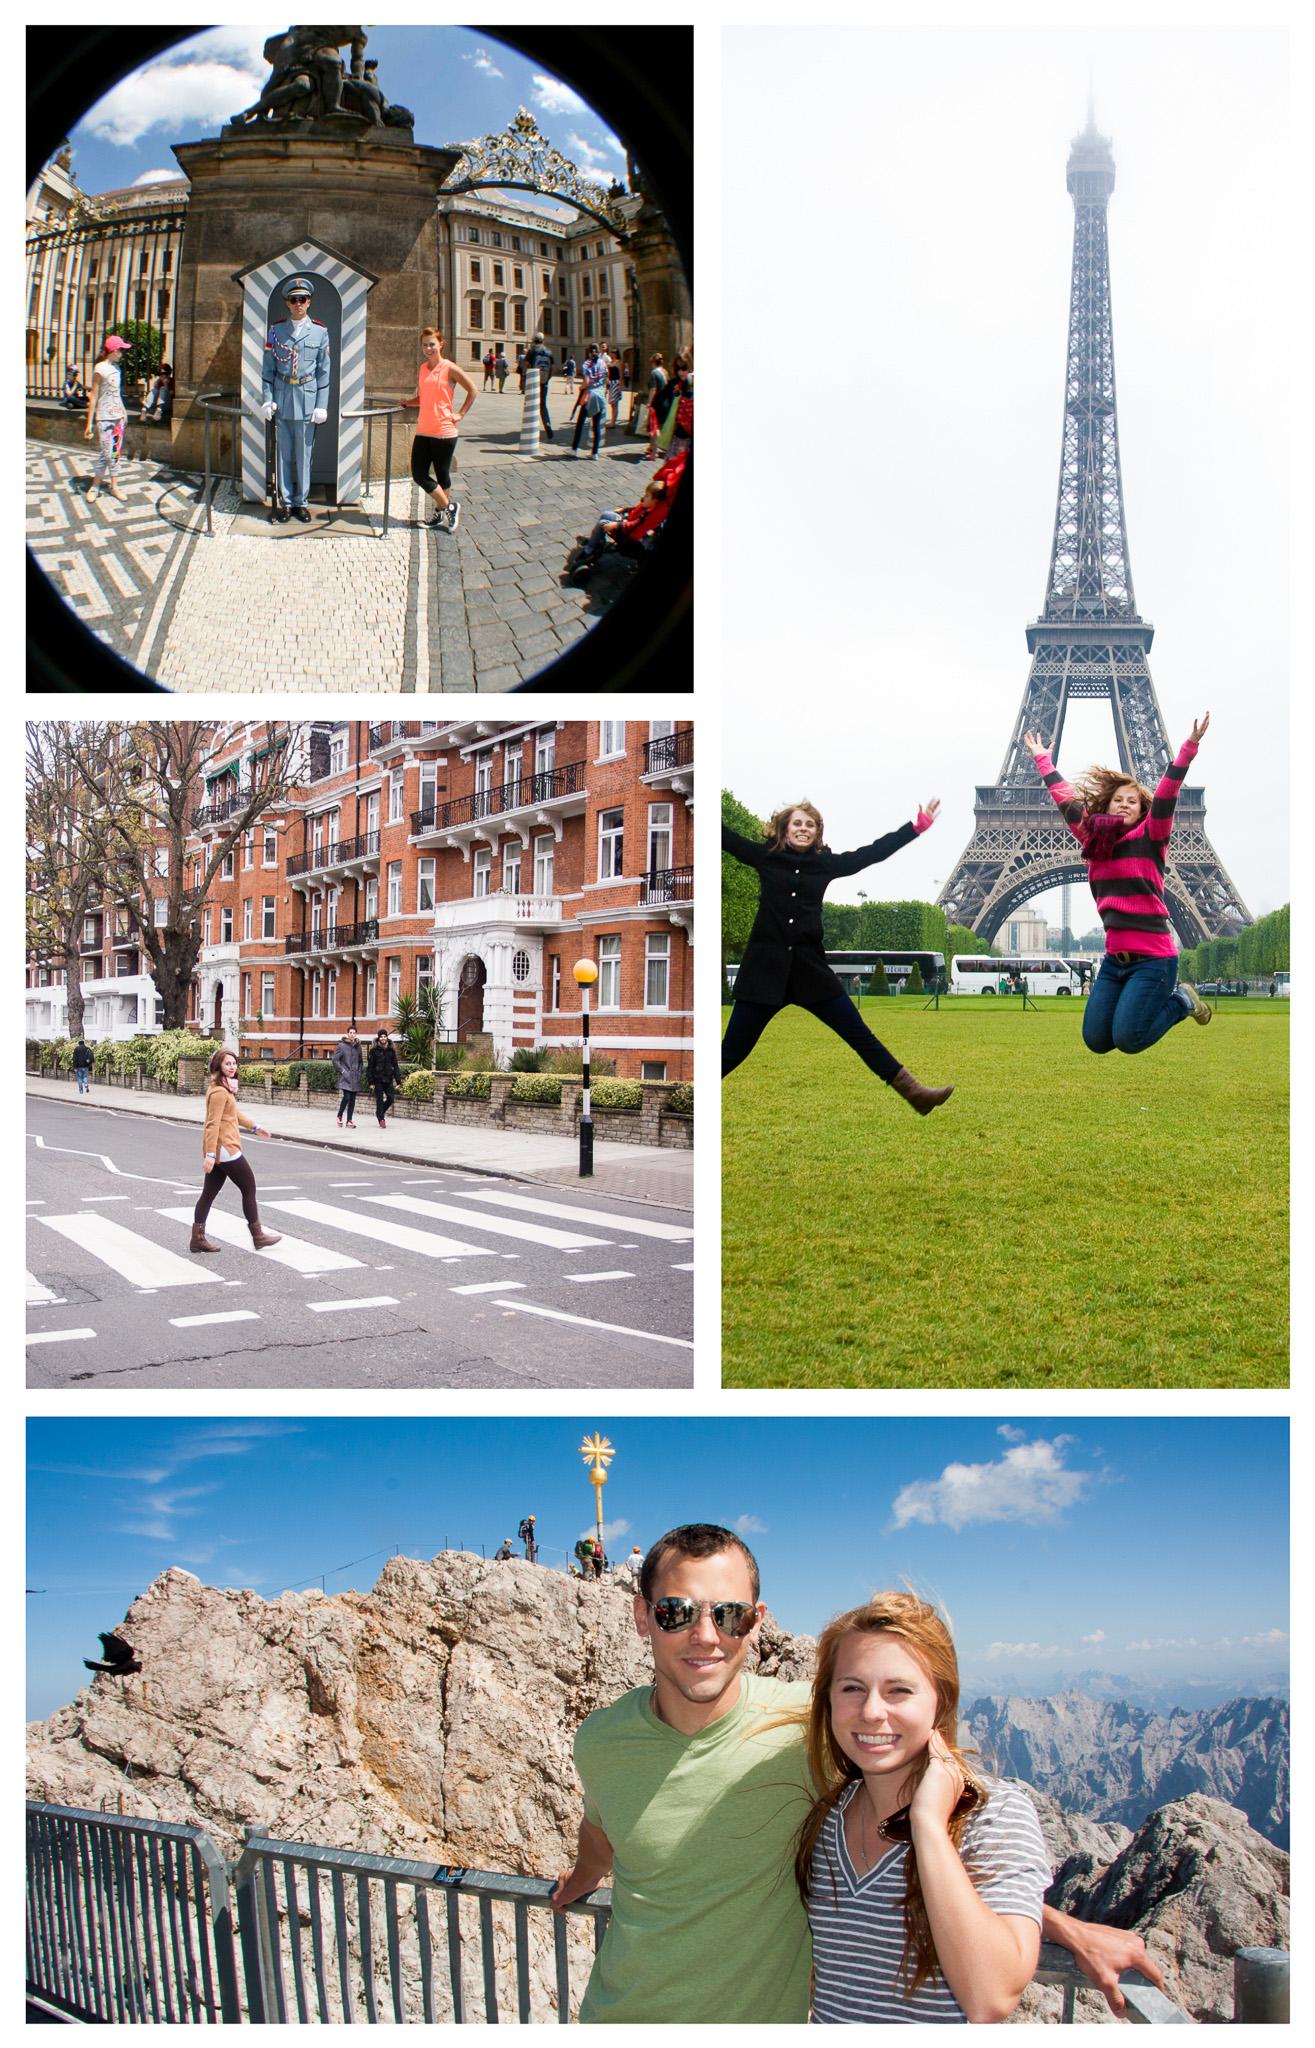 Clockwise: New Palace in Prague, Czech Republic; Eiffel Tower in Paris, France; Zugspitze, Garmisch-Partenkirchen, Germany; Abbey Road, London, England